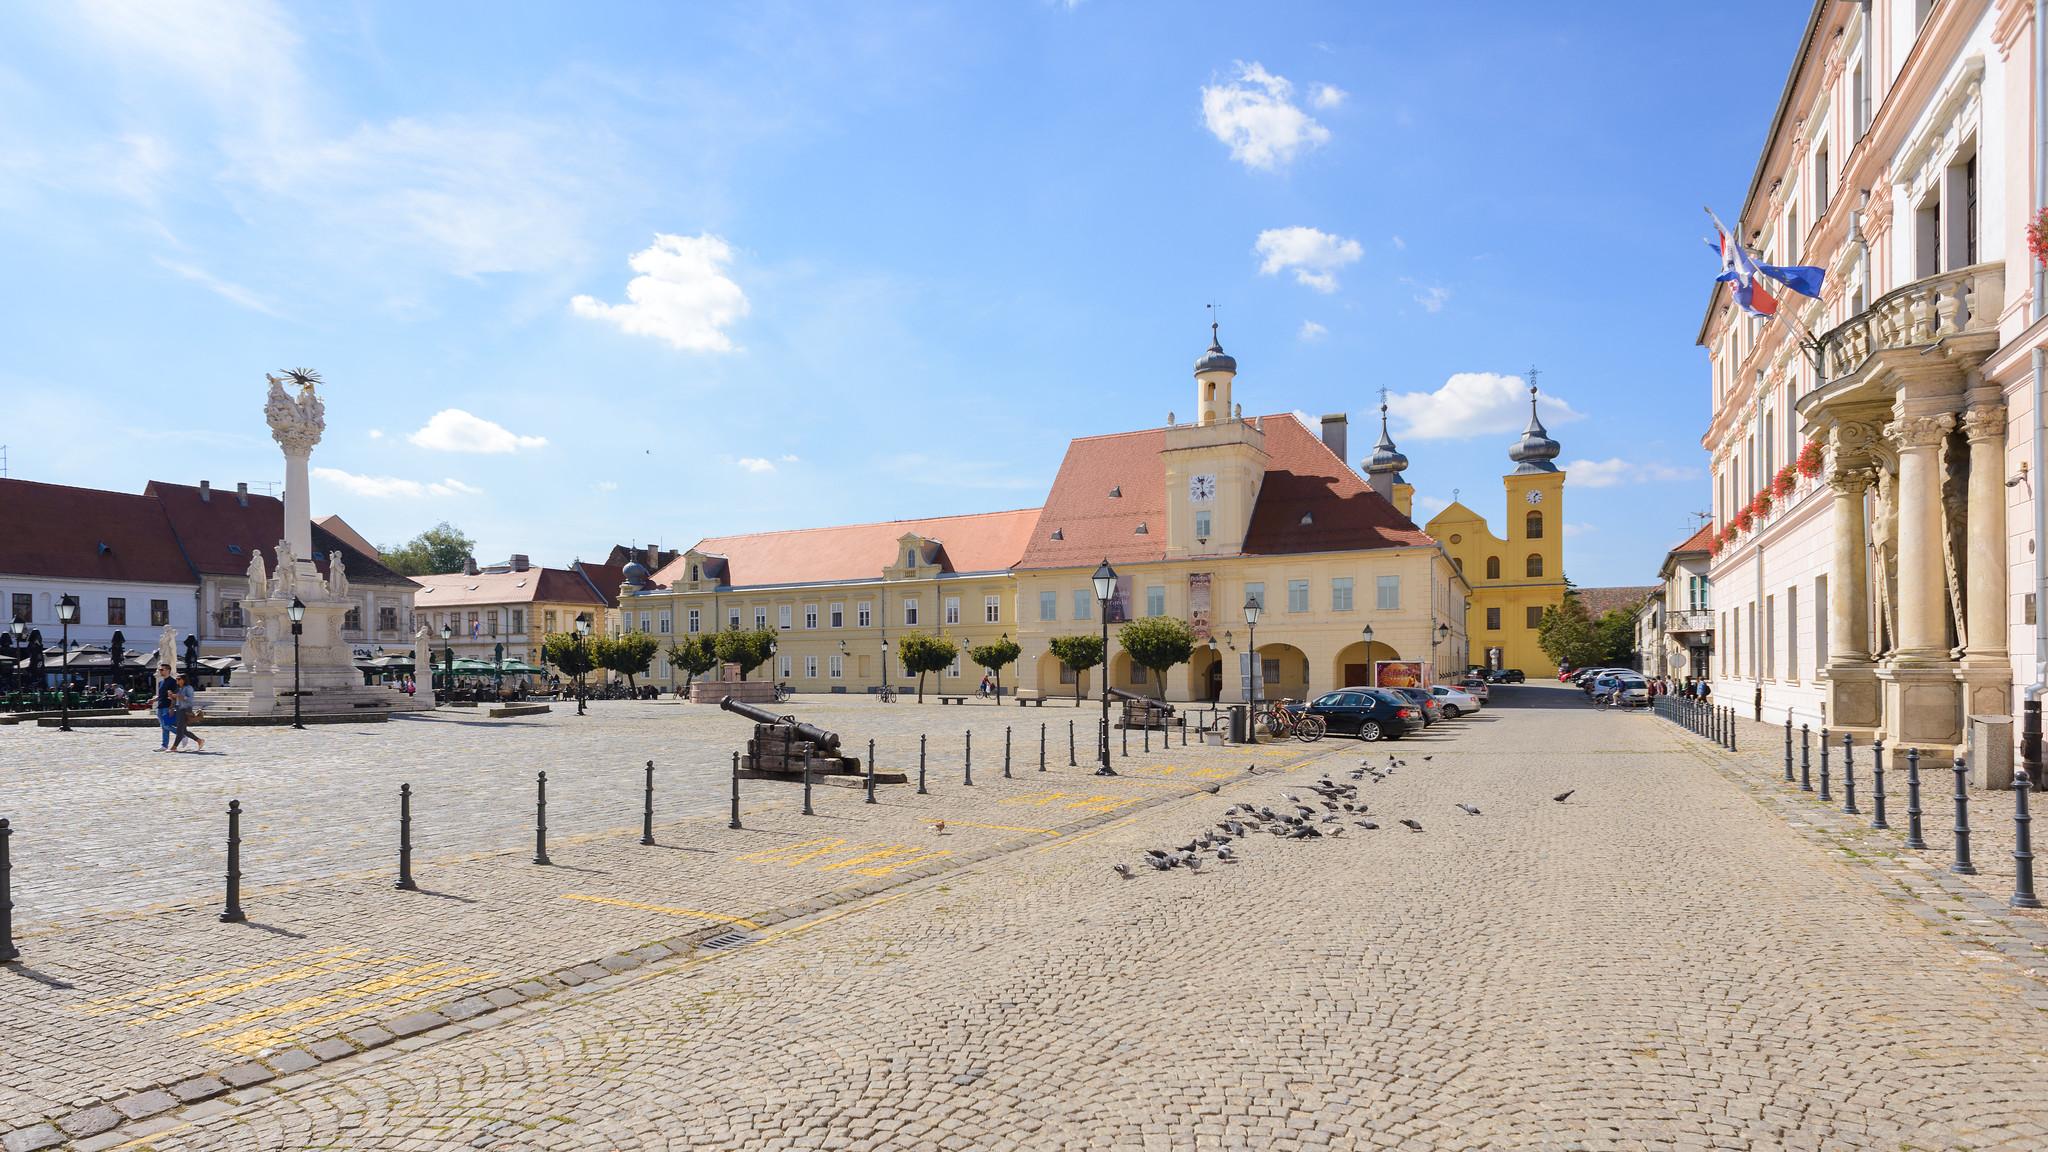 6 Best Things to do in Osijek, Croatia